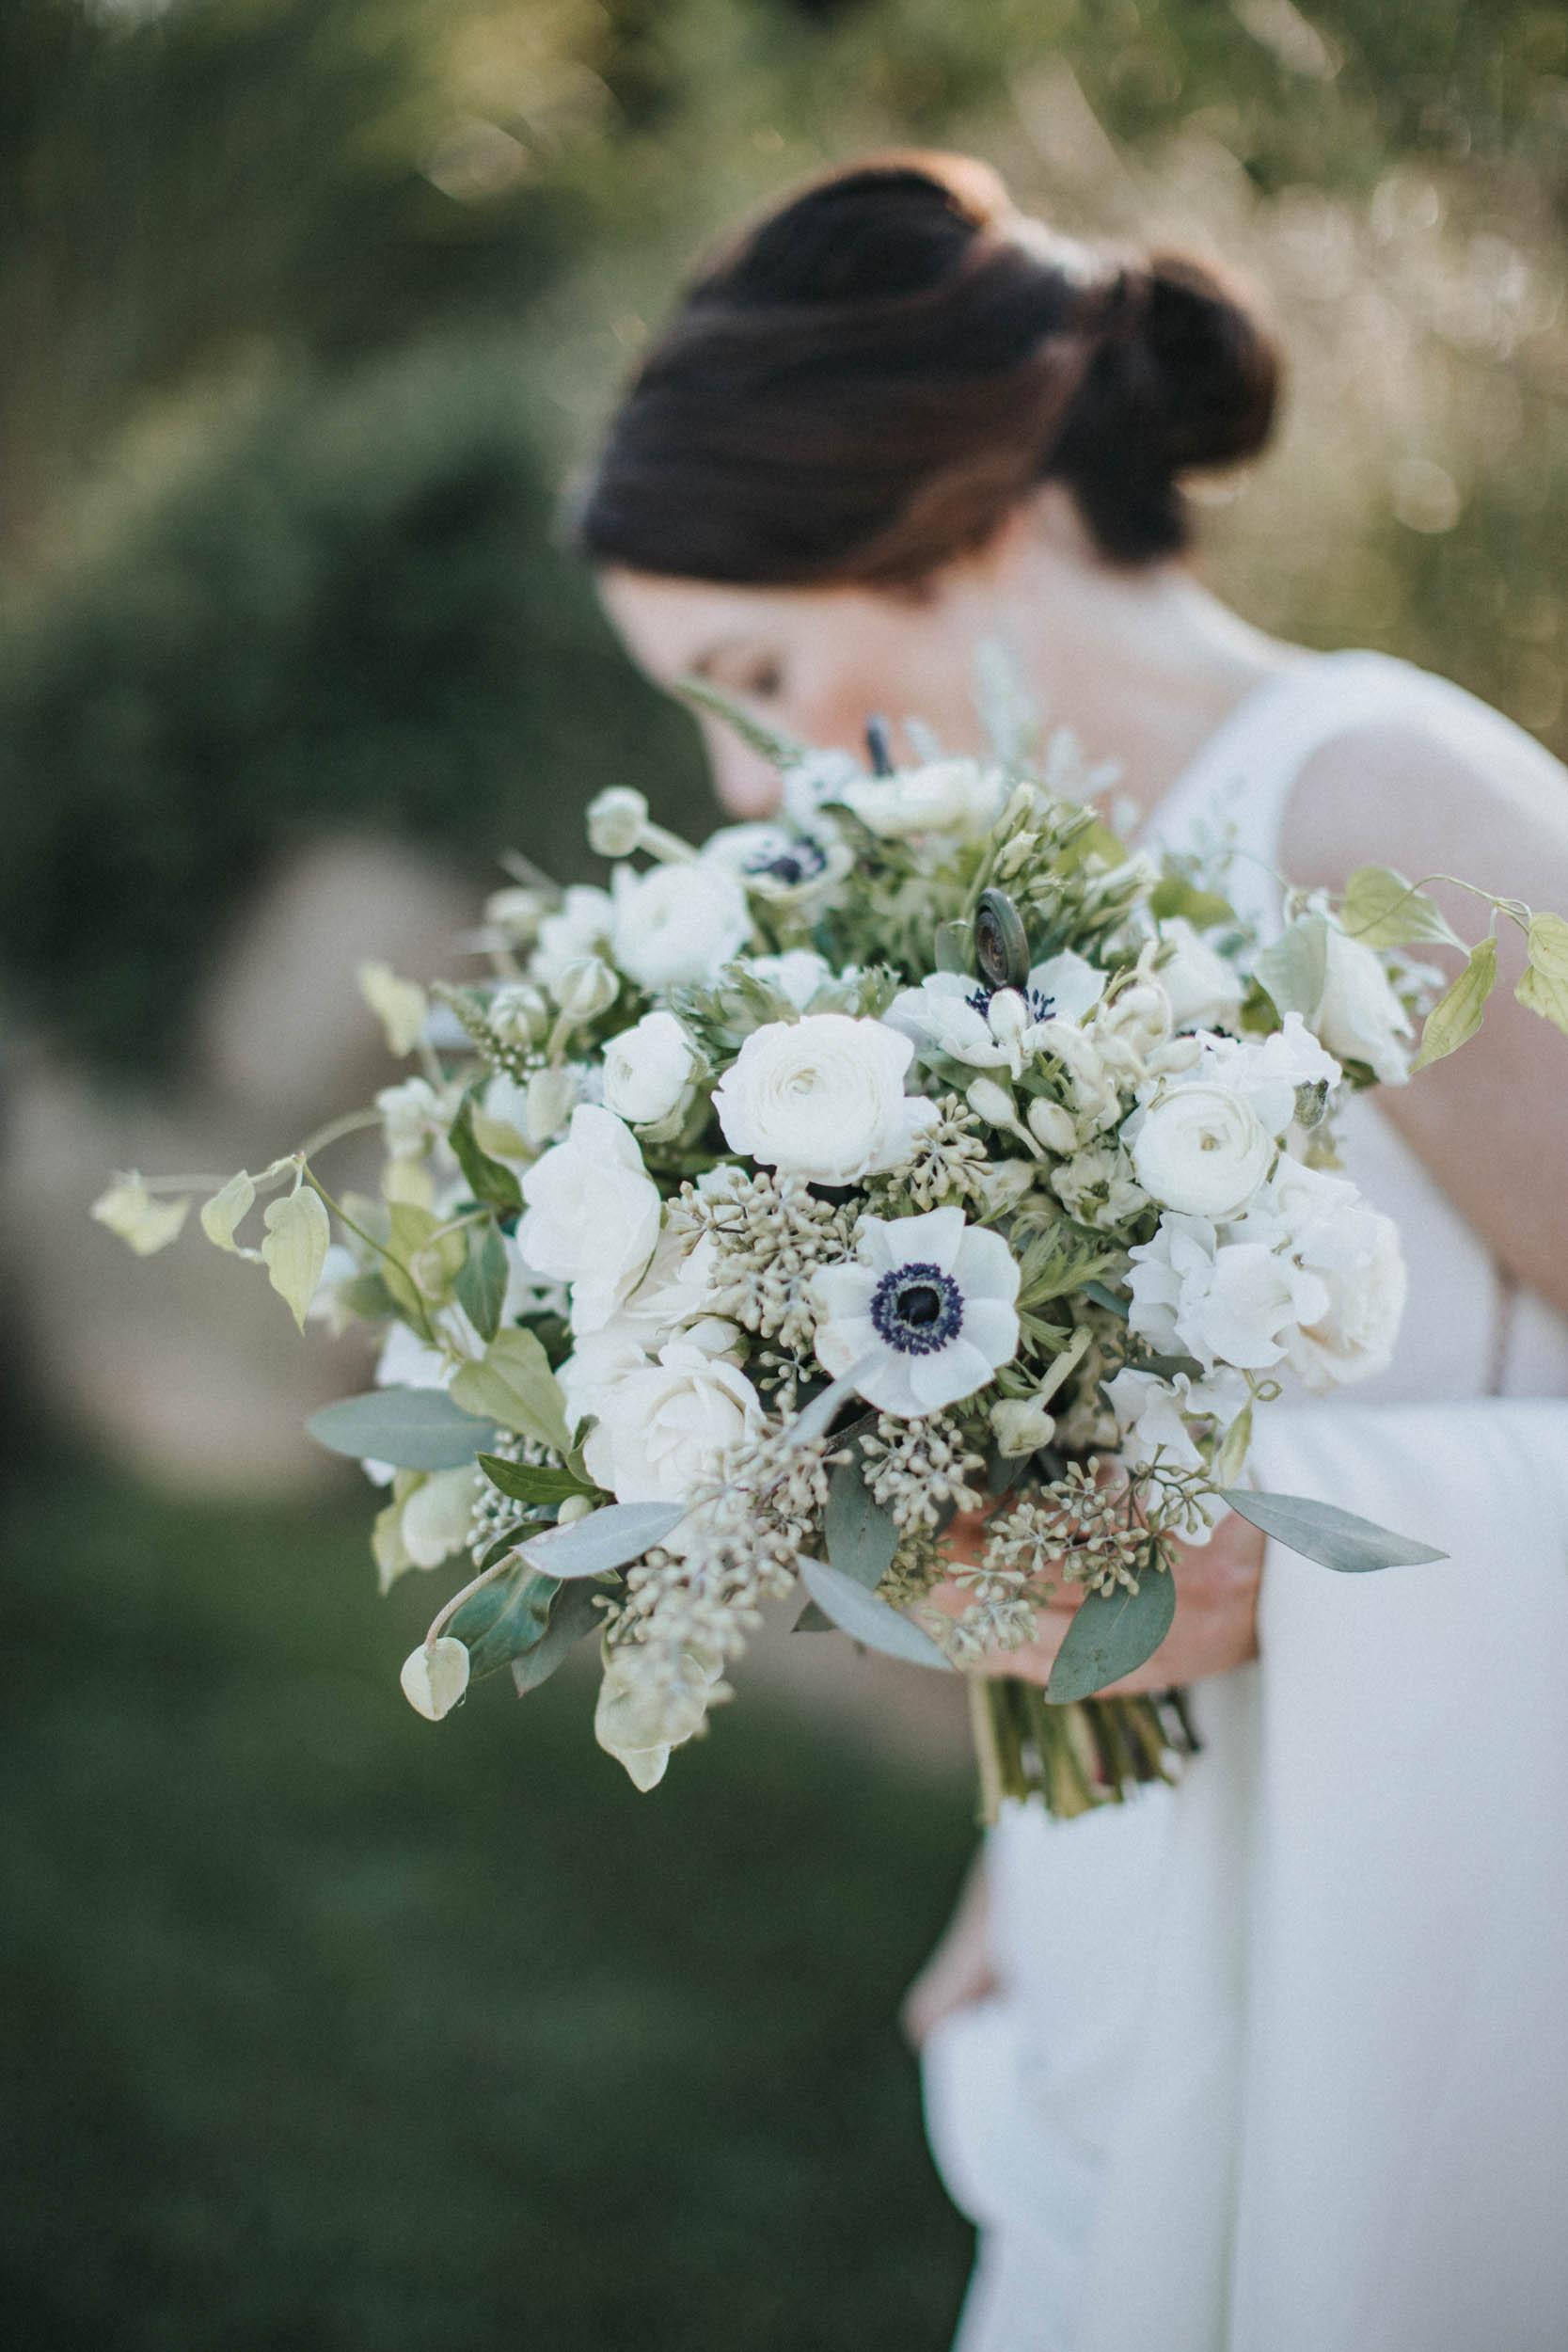 lilacs-florals-wedding-florist-bouquets-hires-021.jpg